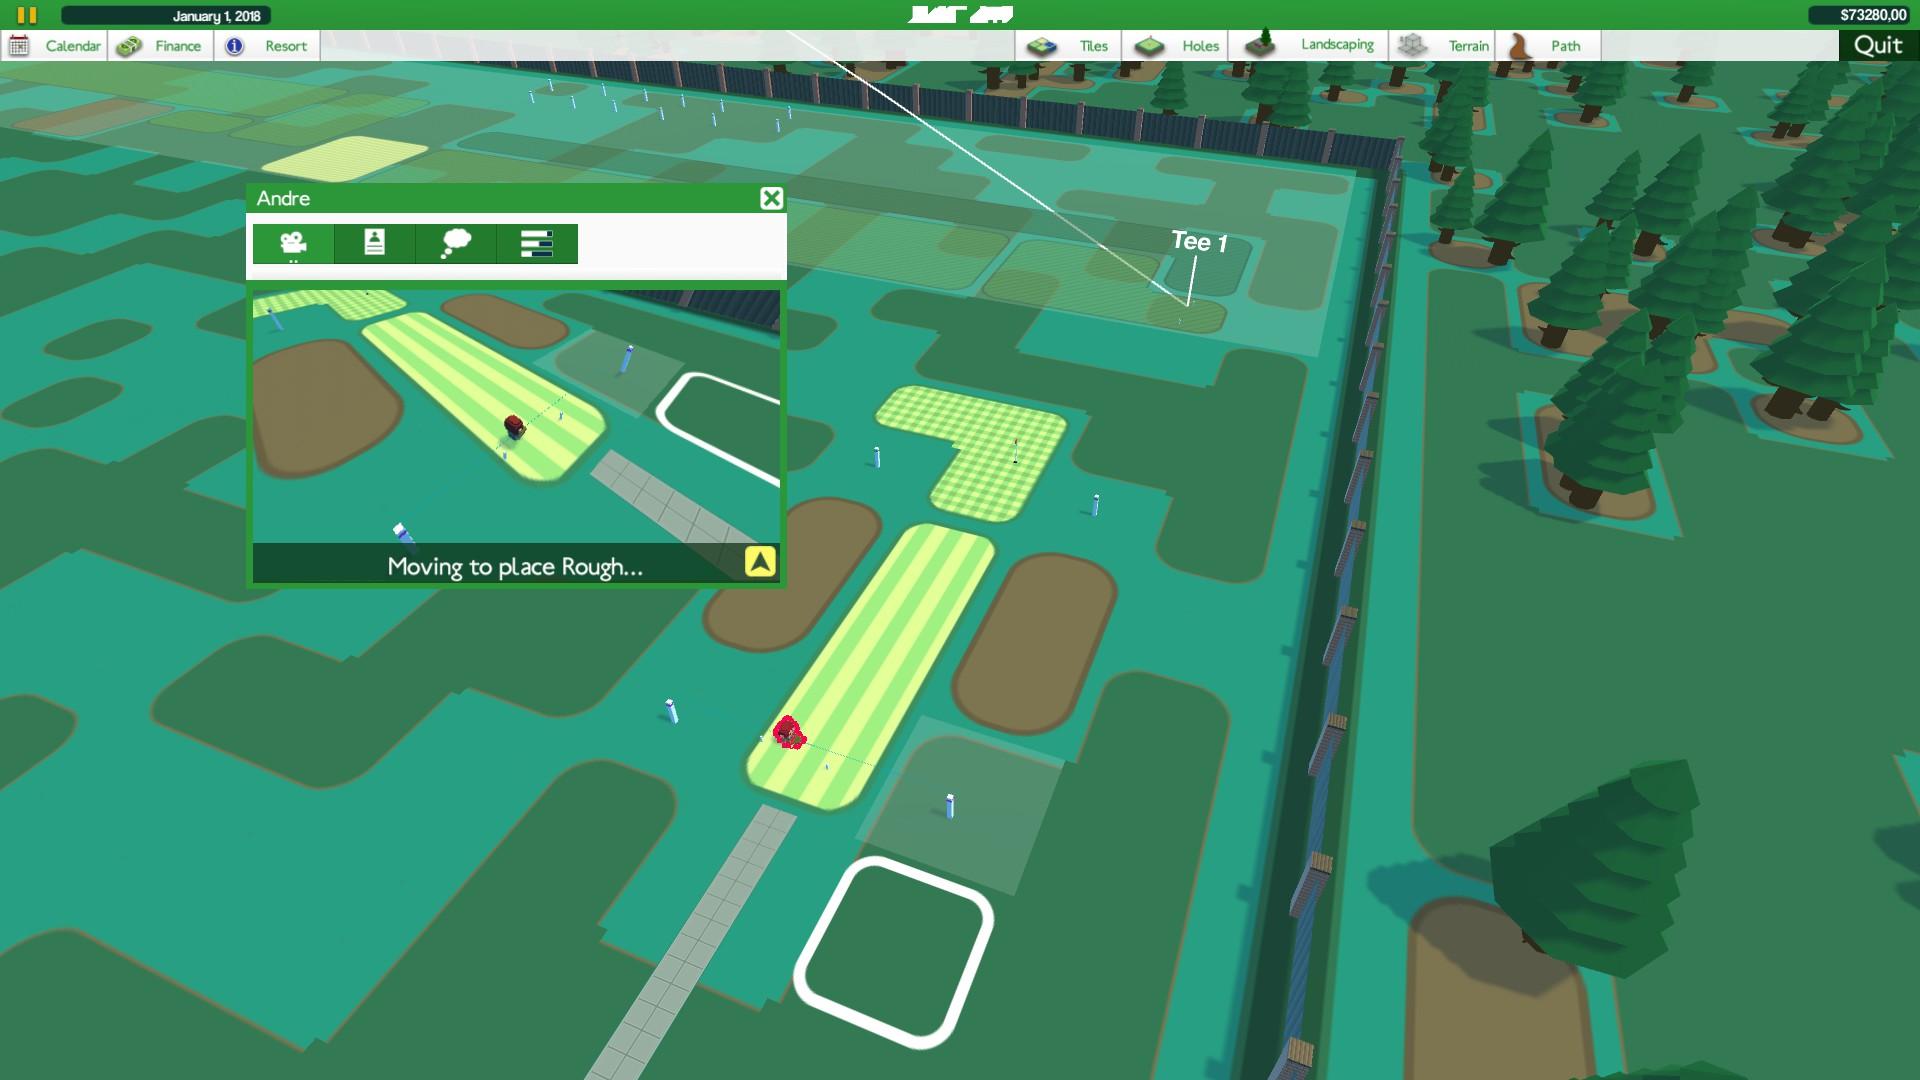 CELESTE: Sims glory hole